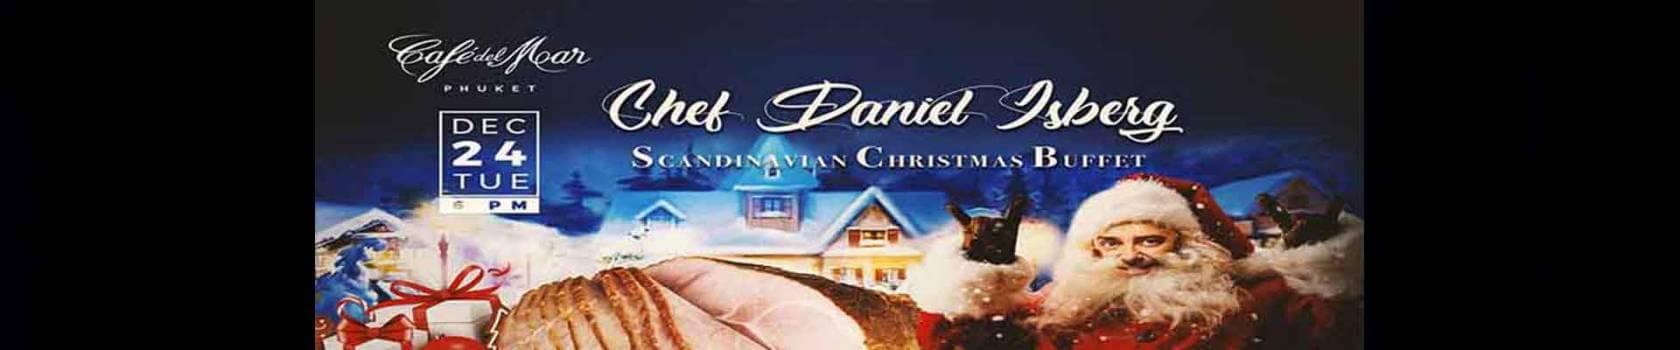 Chef Daniel Isberg Scandinavian Christmas Buffet